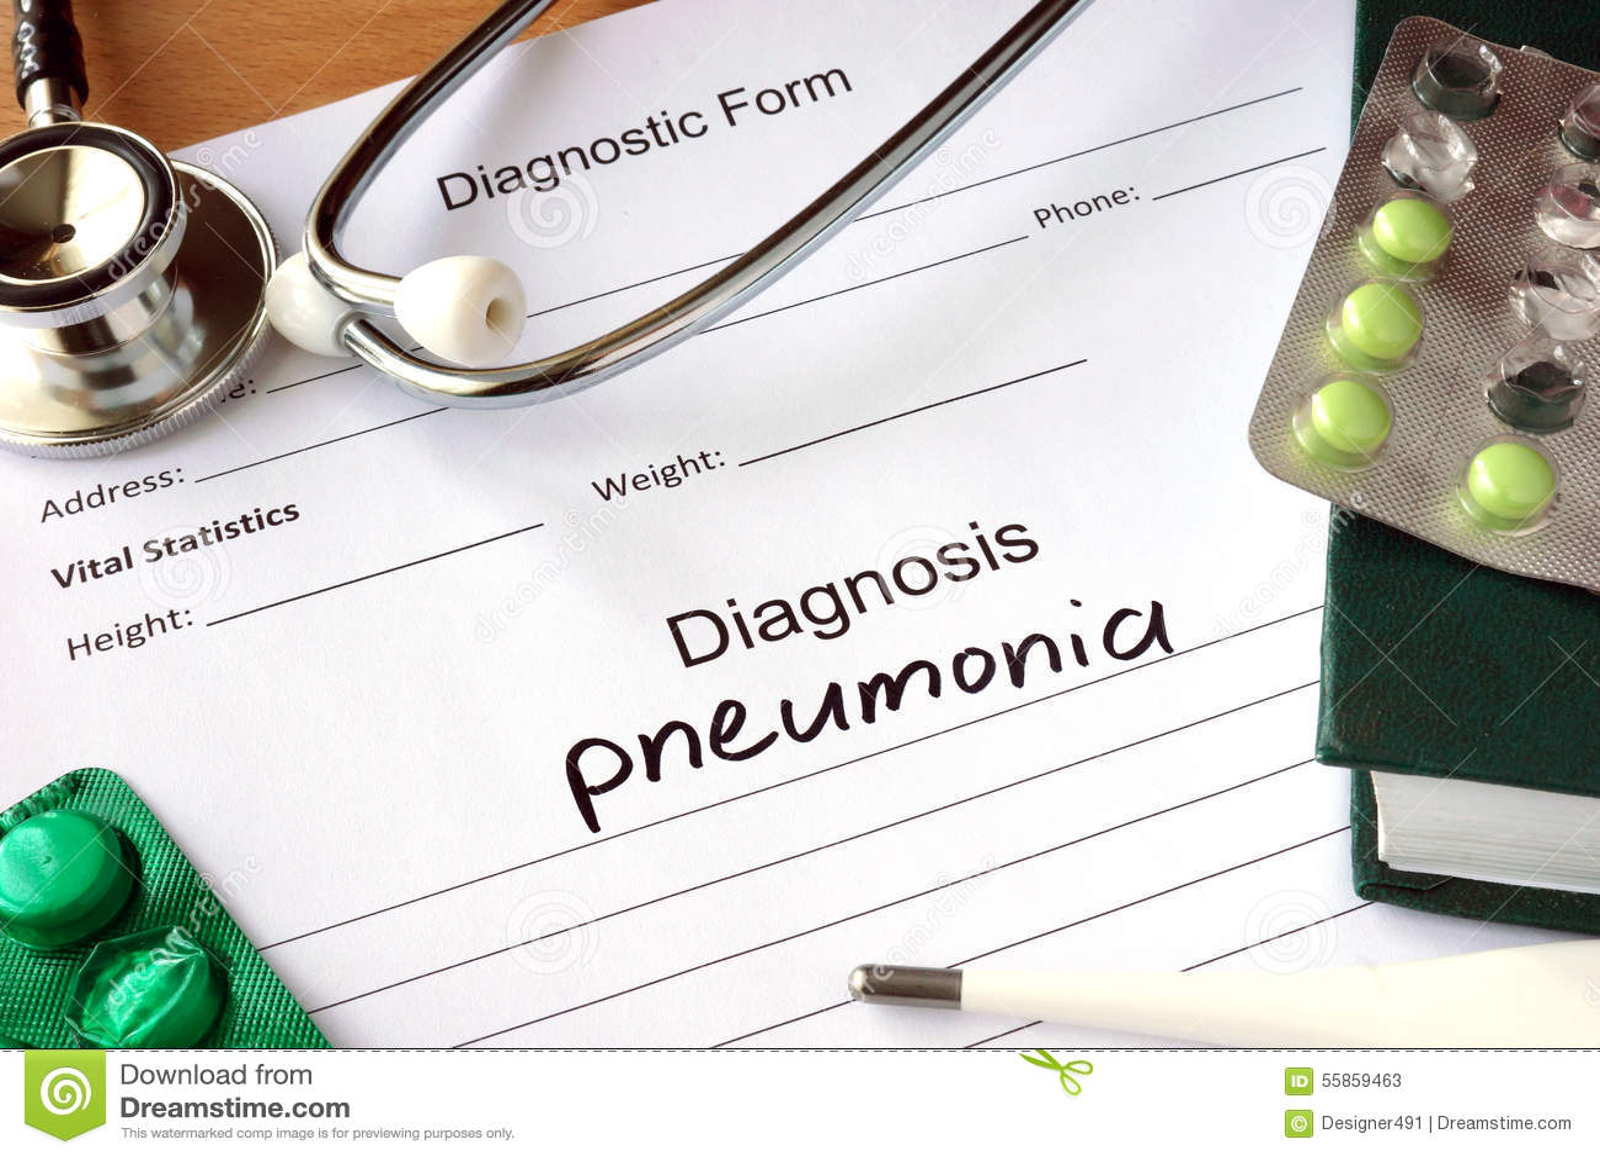 Diagnosis pneumonia and stethoscope.